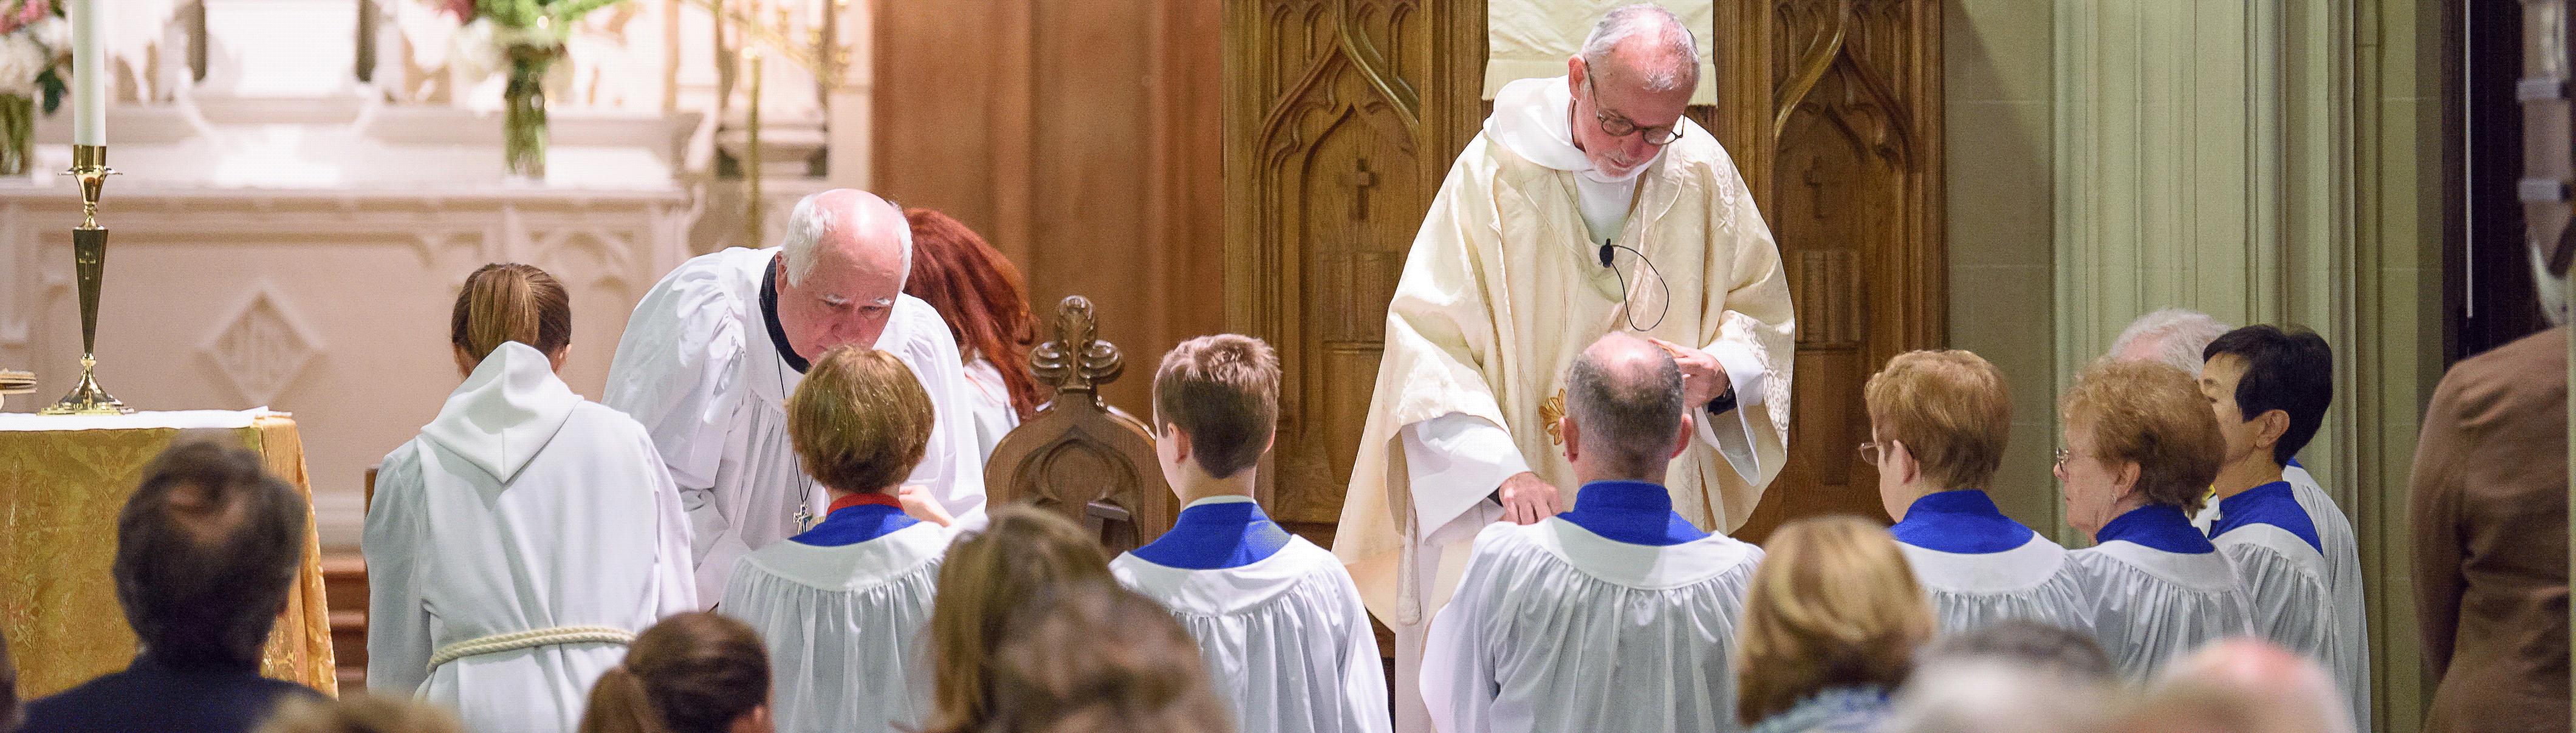 communion-wide